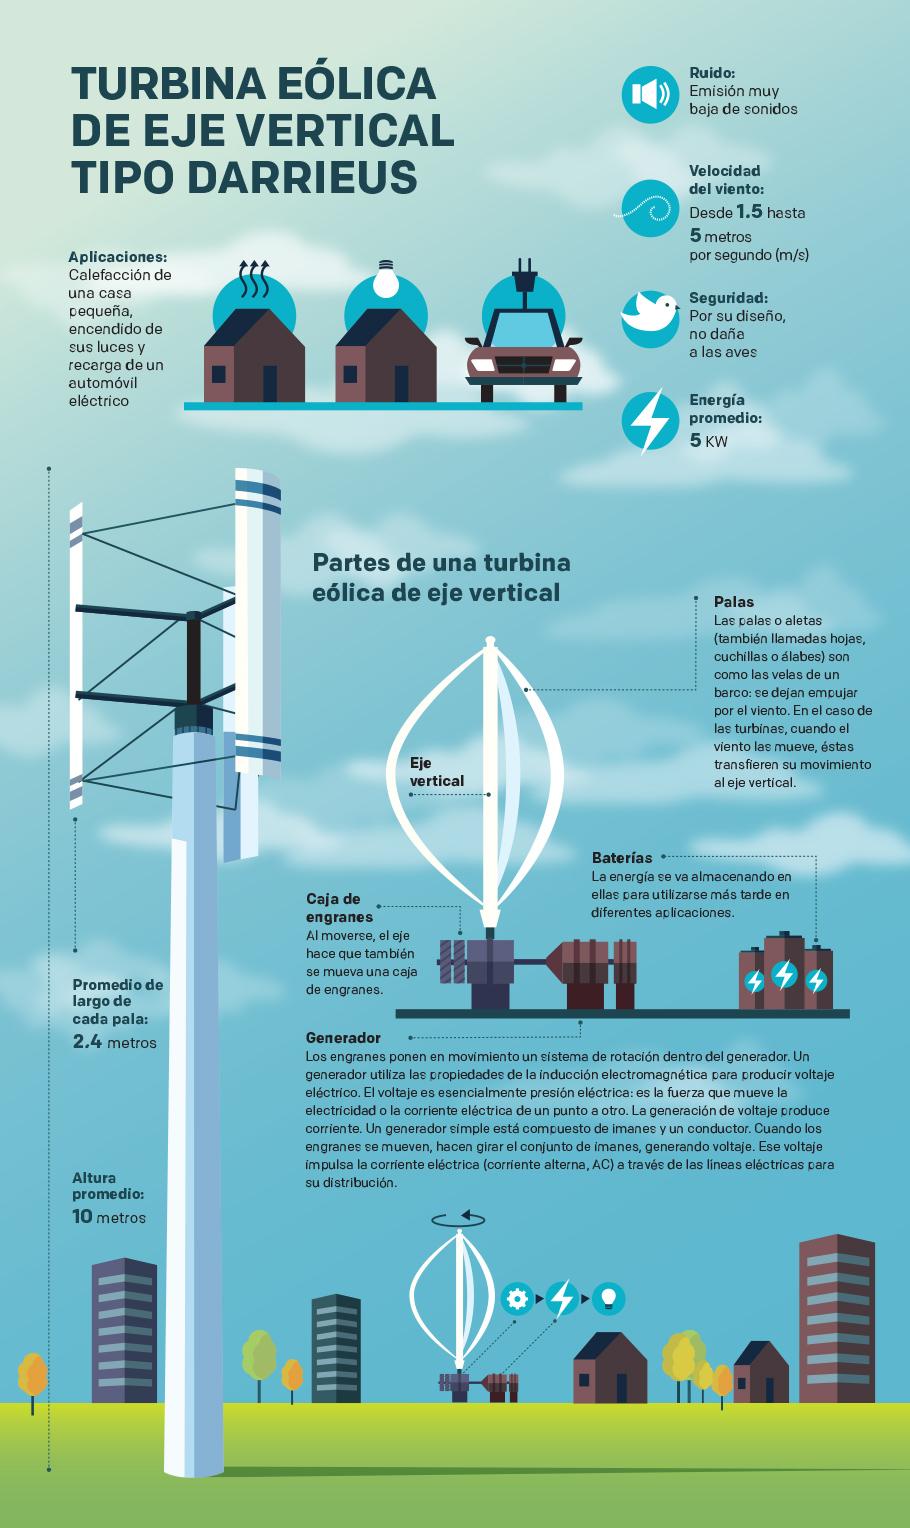 turbina eólica de eje vertical